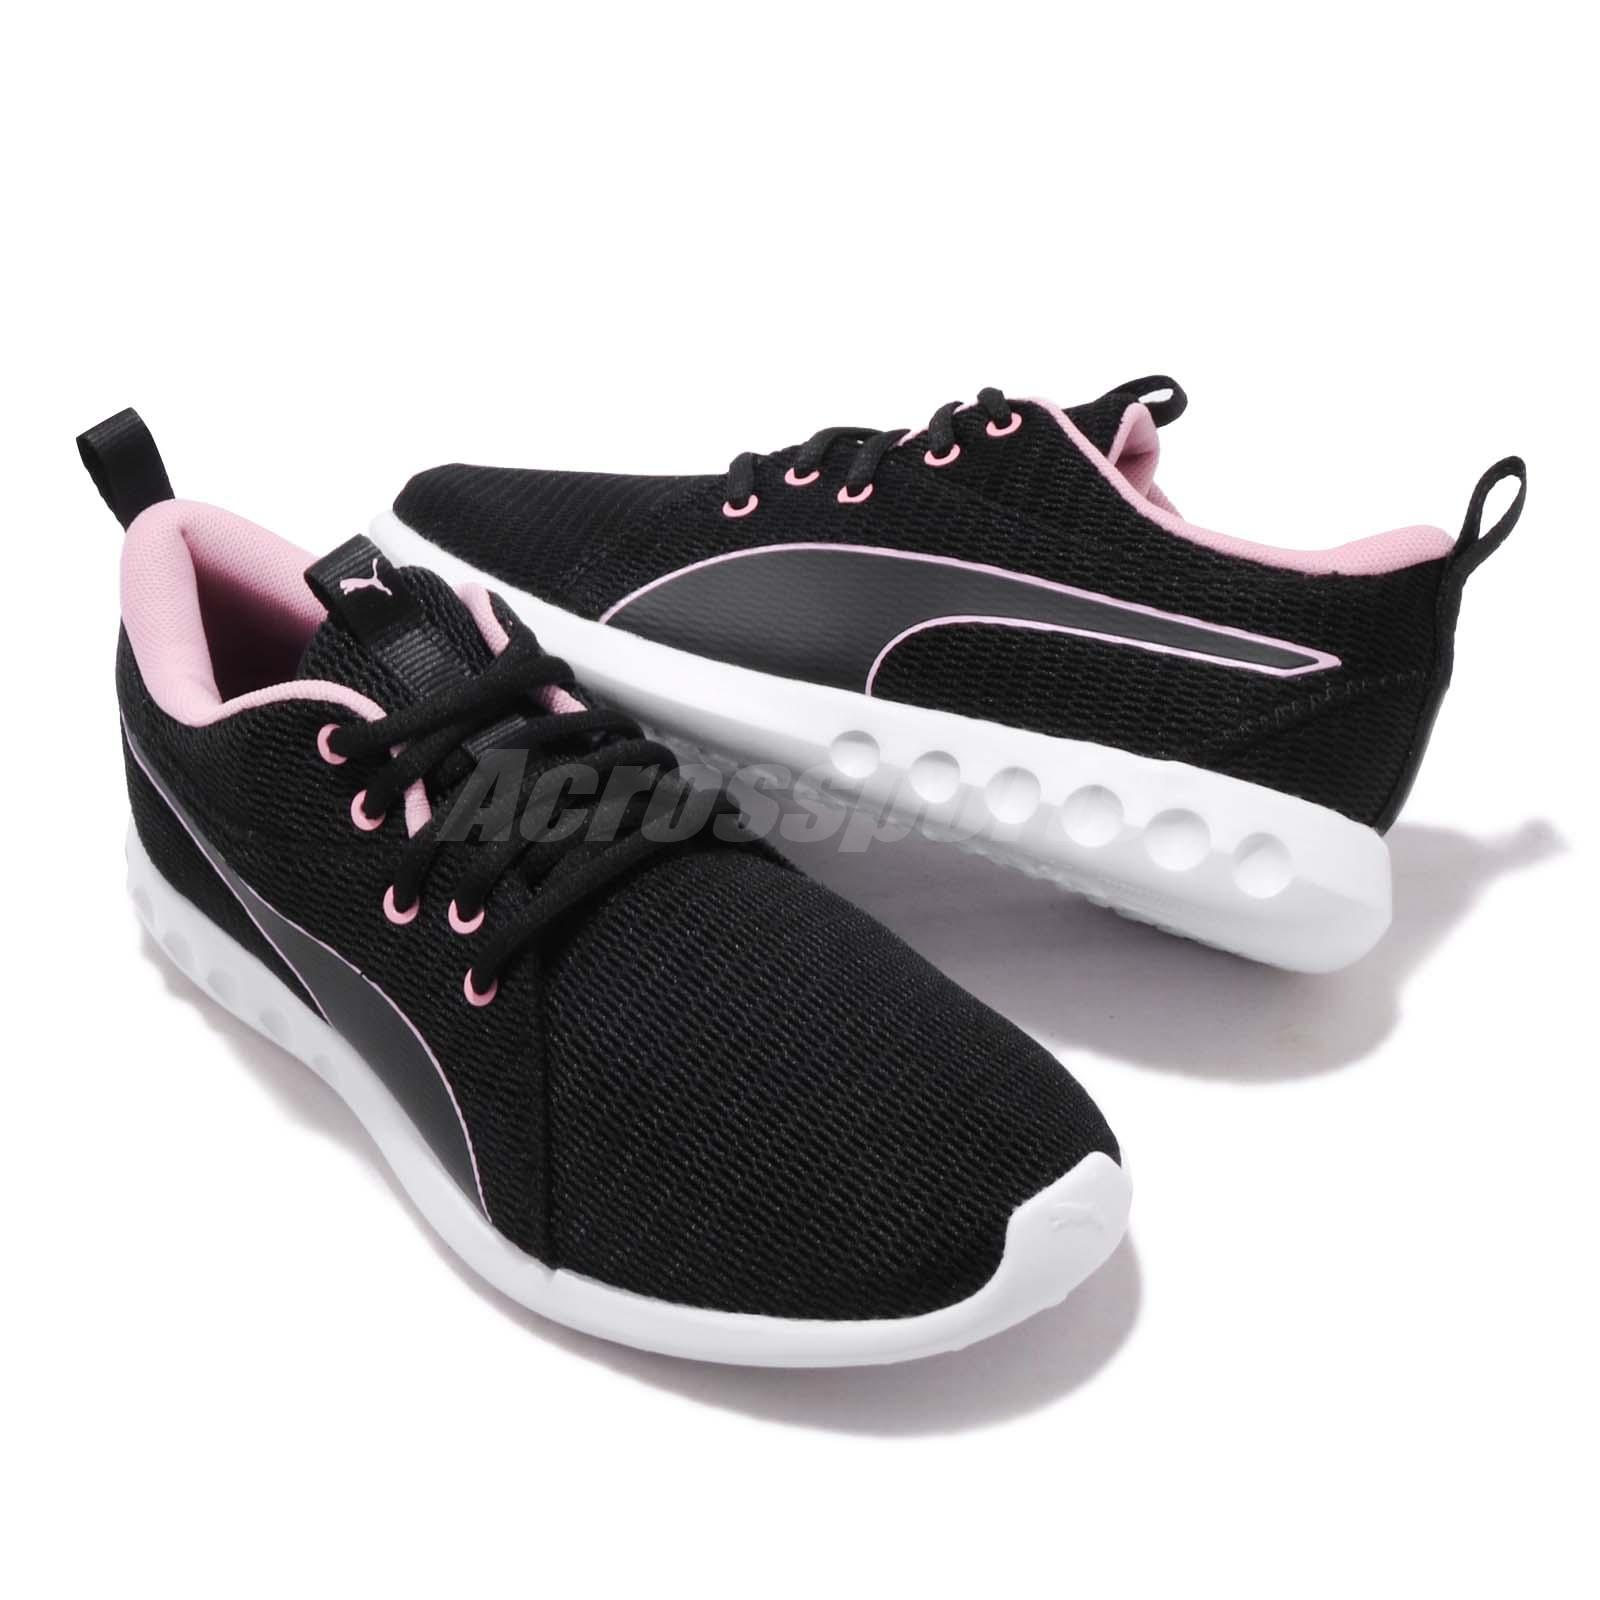 466b43022dd Puma Carson 2 New Core Wns Black Pale Pink White Women Running Shoes ...